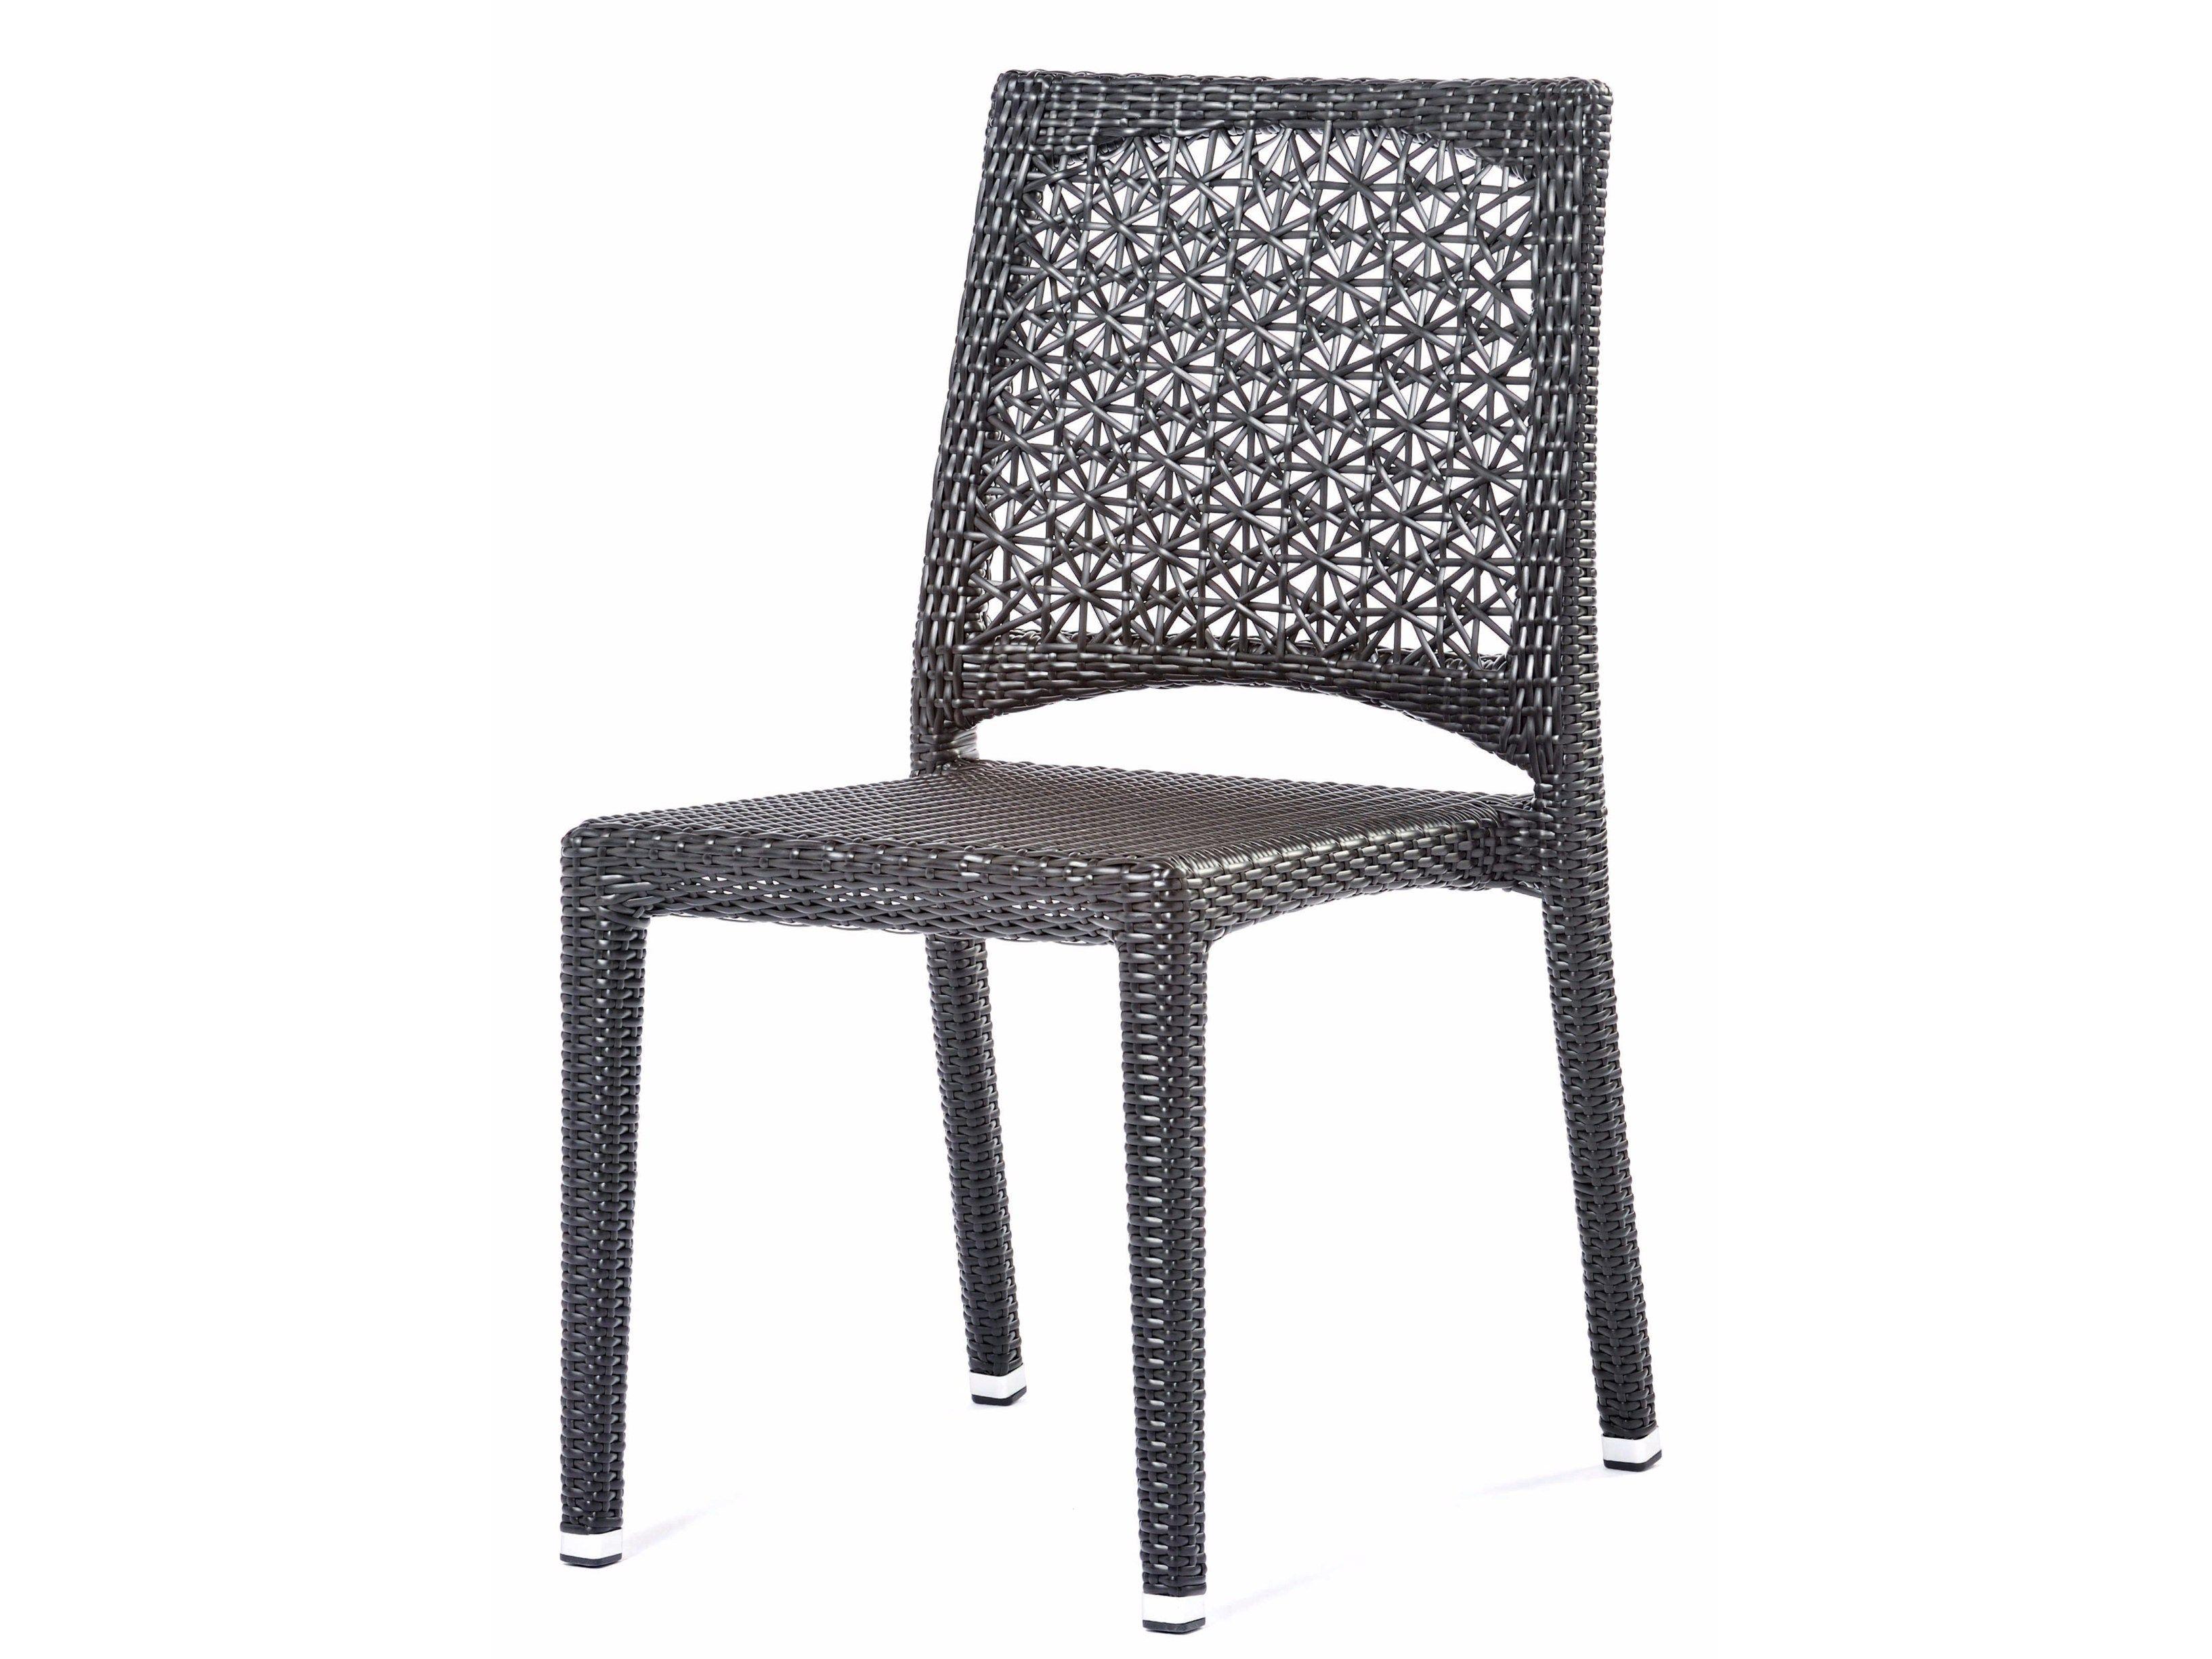 Outdoor furniture by Varaschin